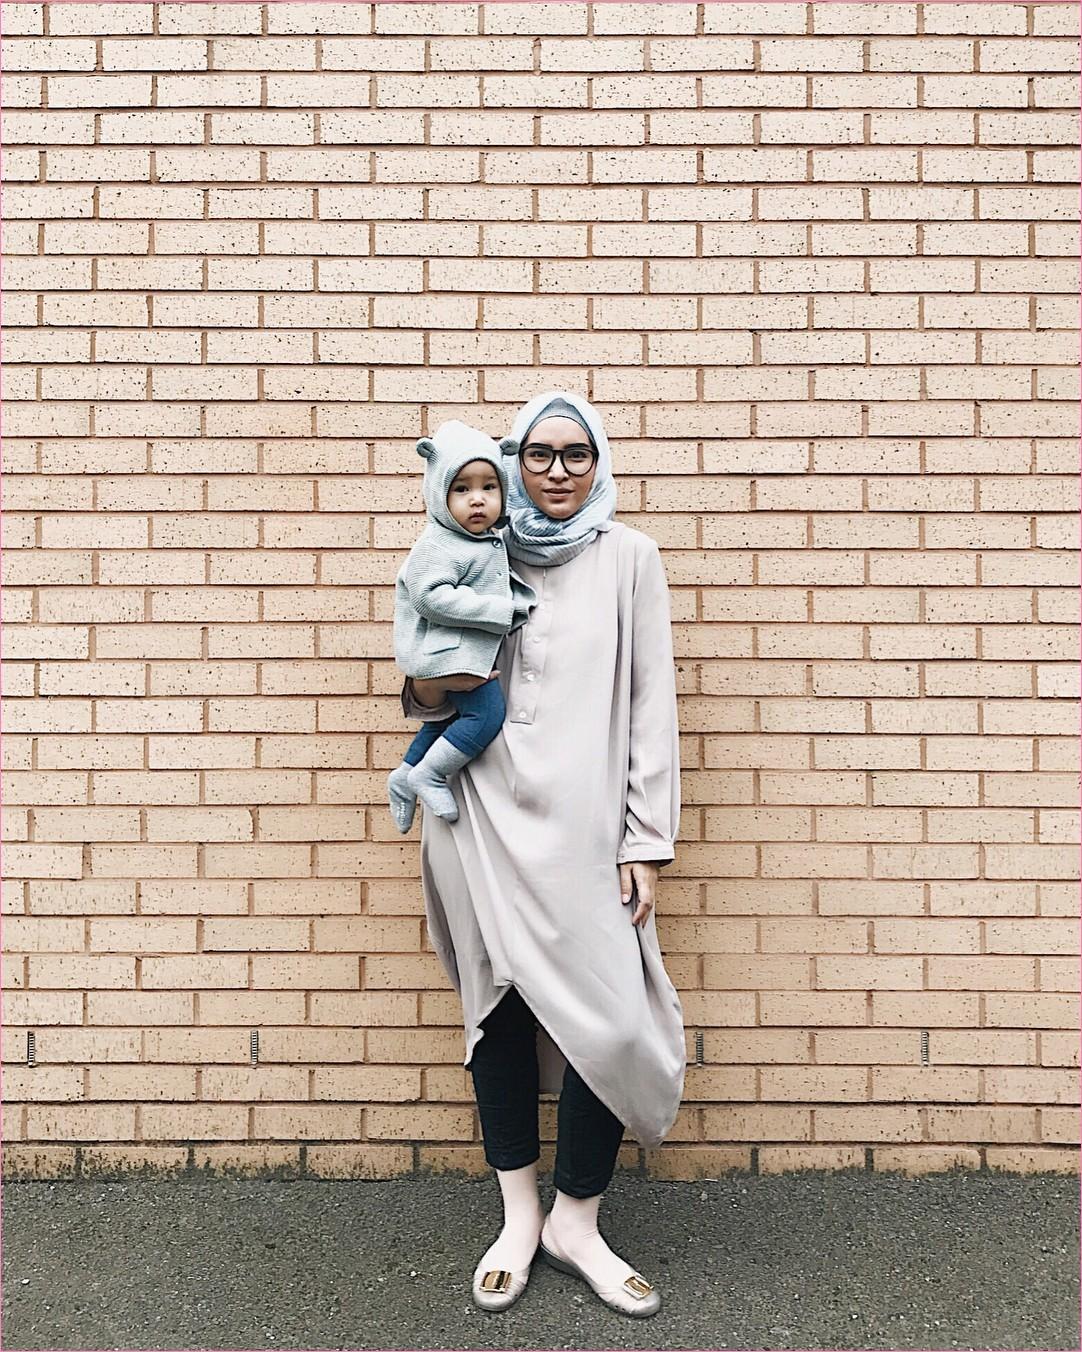 Outfit Baju Tunic Untuk Hijabers Ala Selebgram 2018 baju tunic krem legging hitam flatshoes kaos kaki stocking kerudung segiempat hijab square abu muda ciput rajut kacamata tembok ootd trendy kekinian style tembok